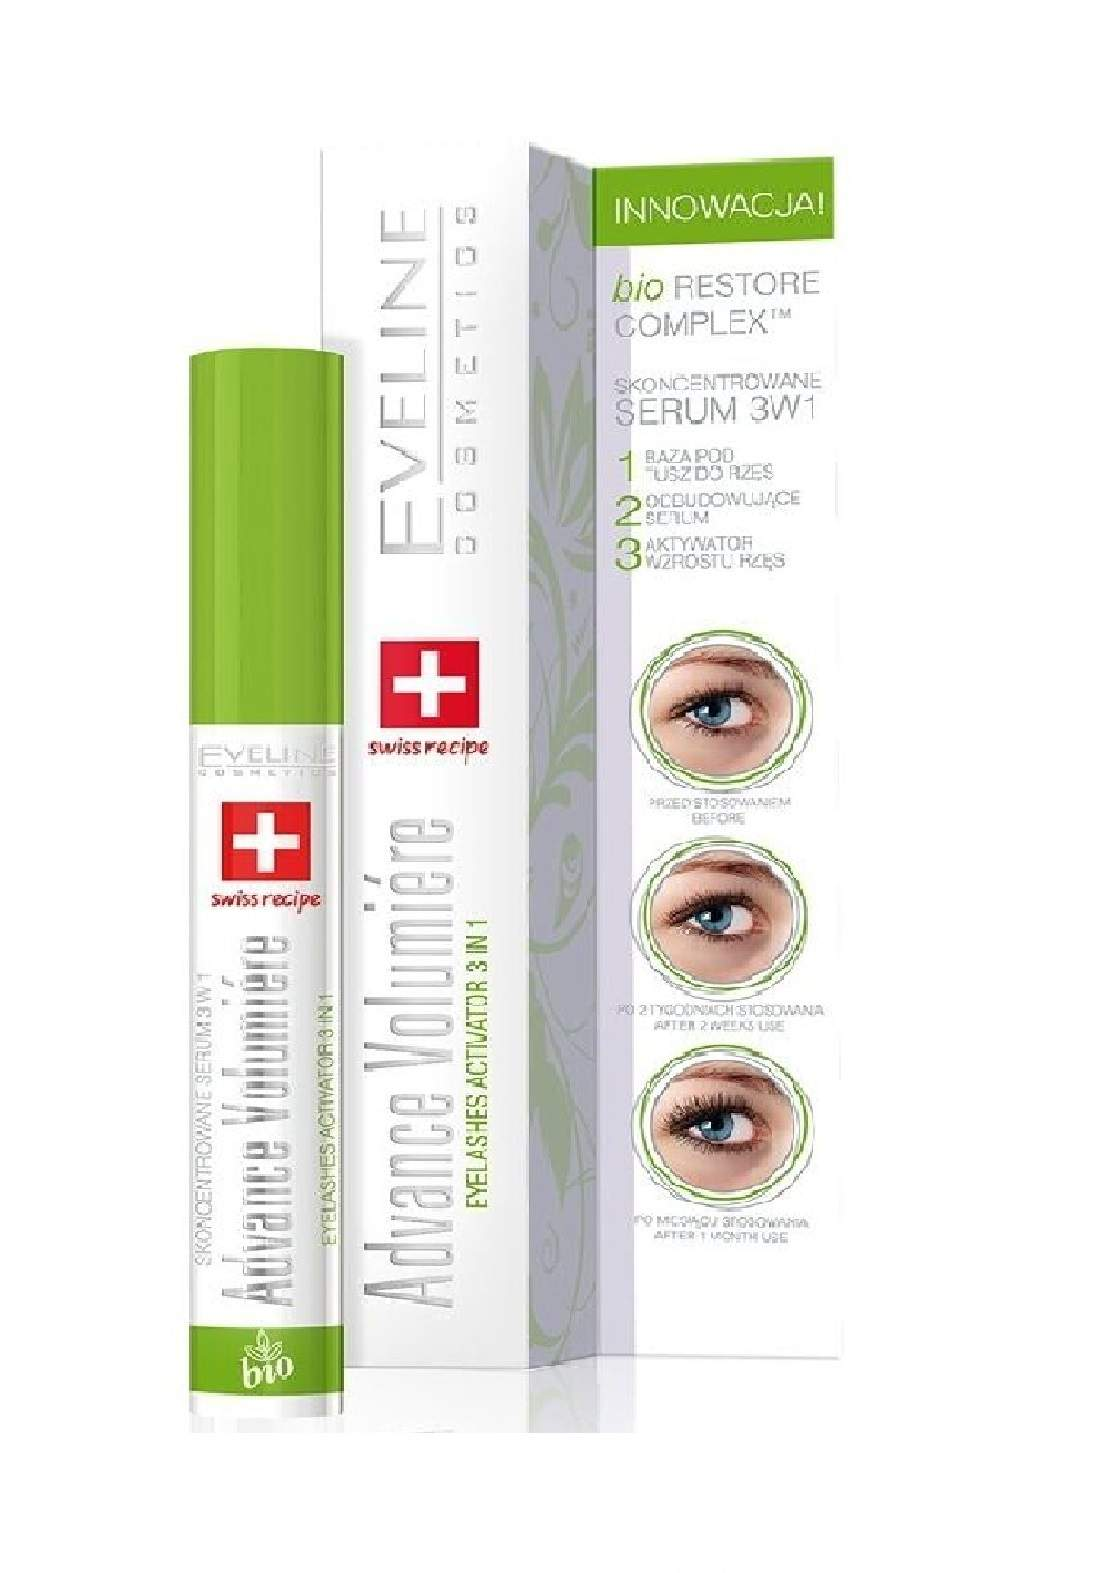 (095-0126)Eveline Concentrated Serum Mascara 3in1 advance volumiere 10ml مسكارا تطويل الرموش